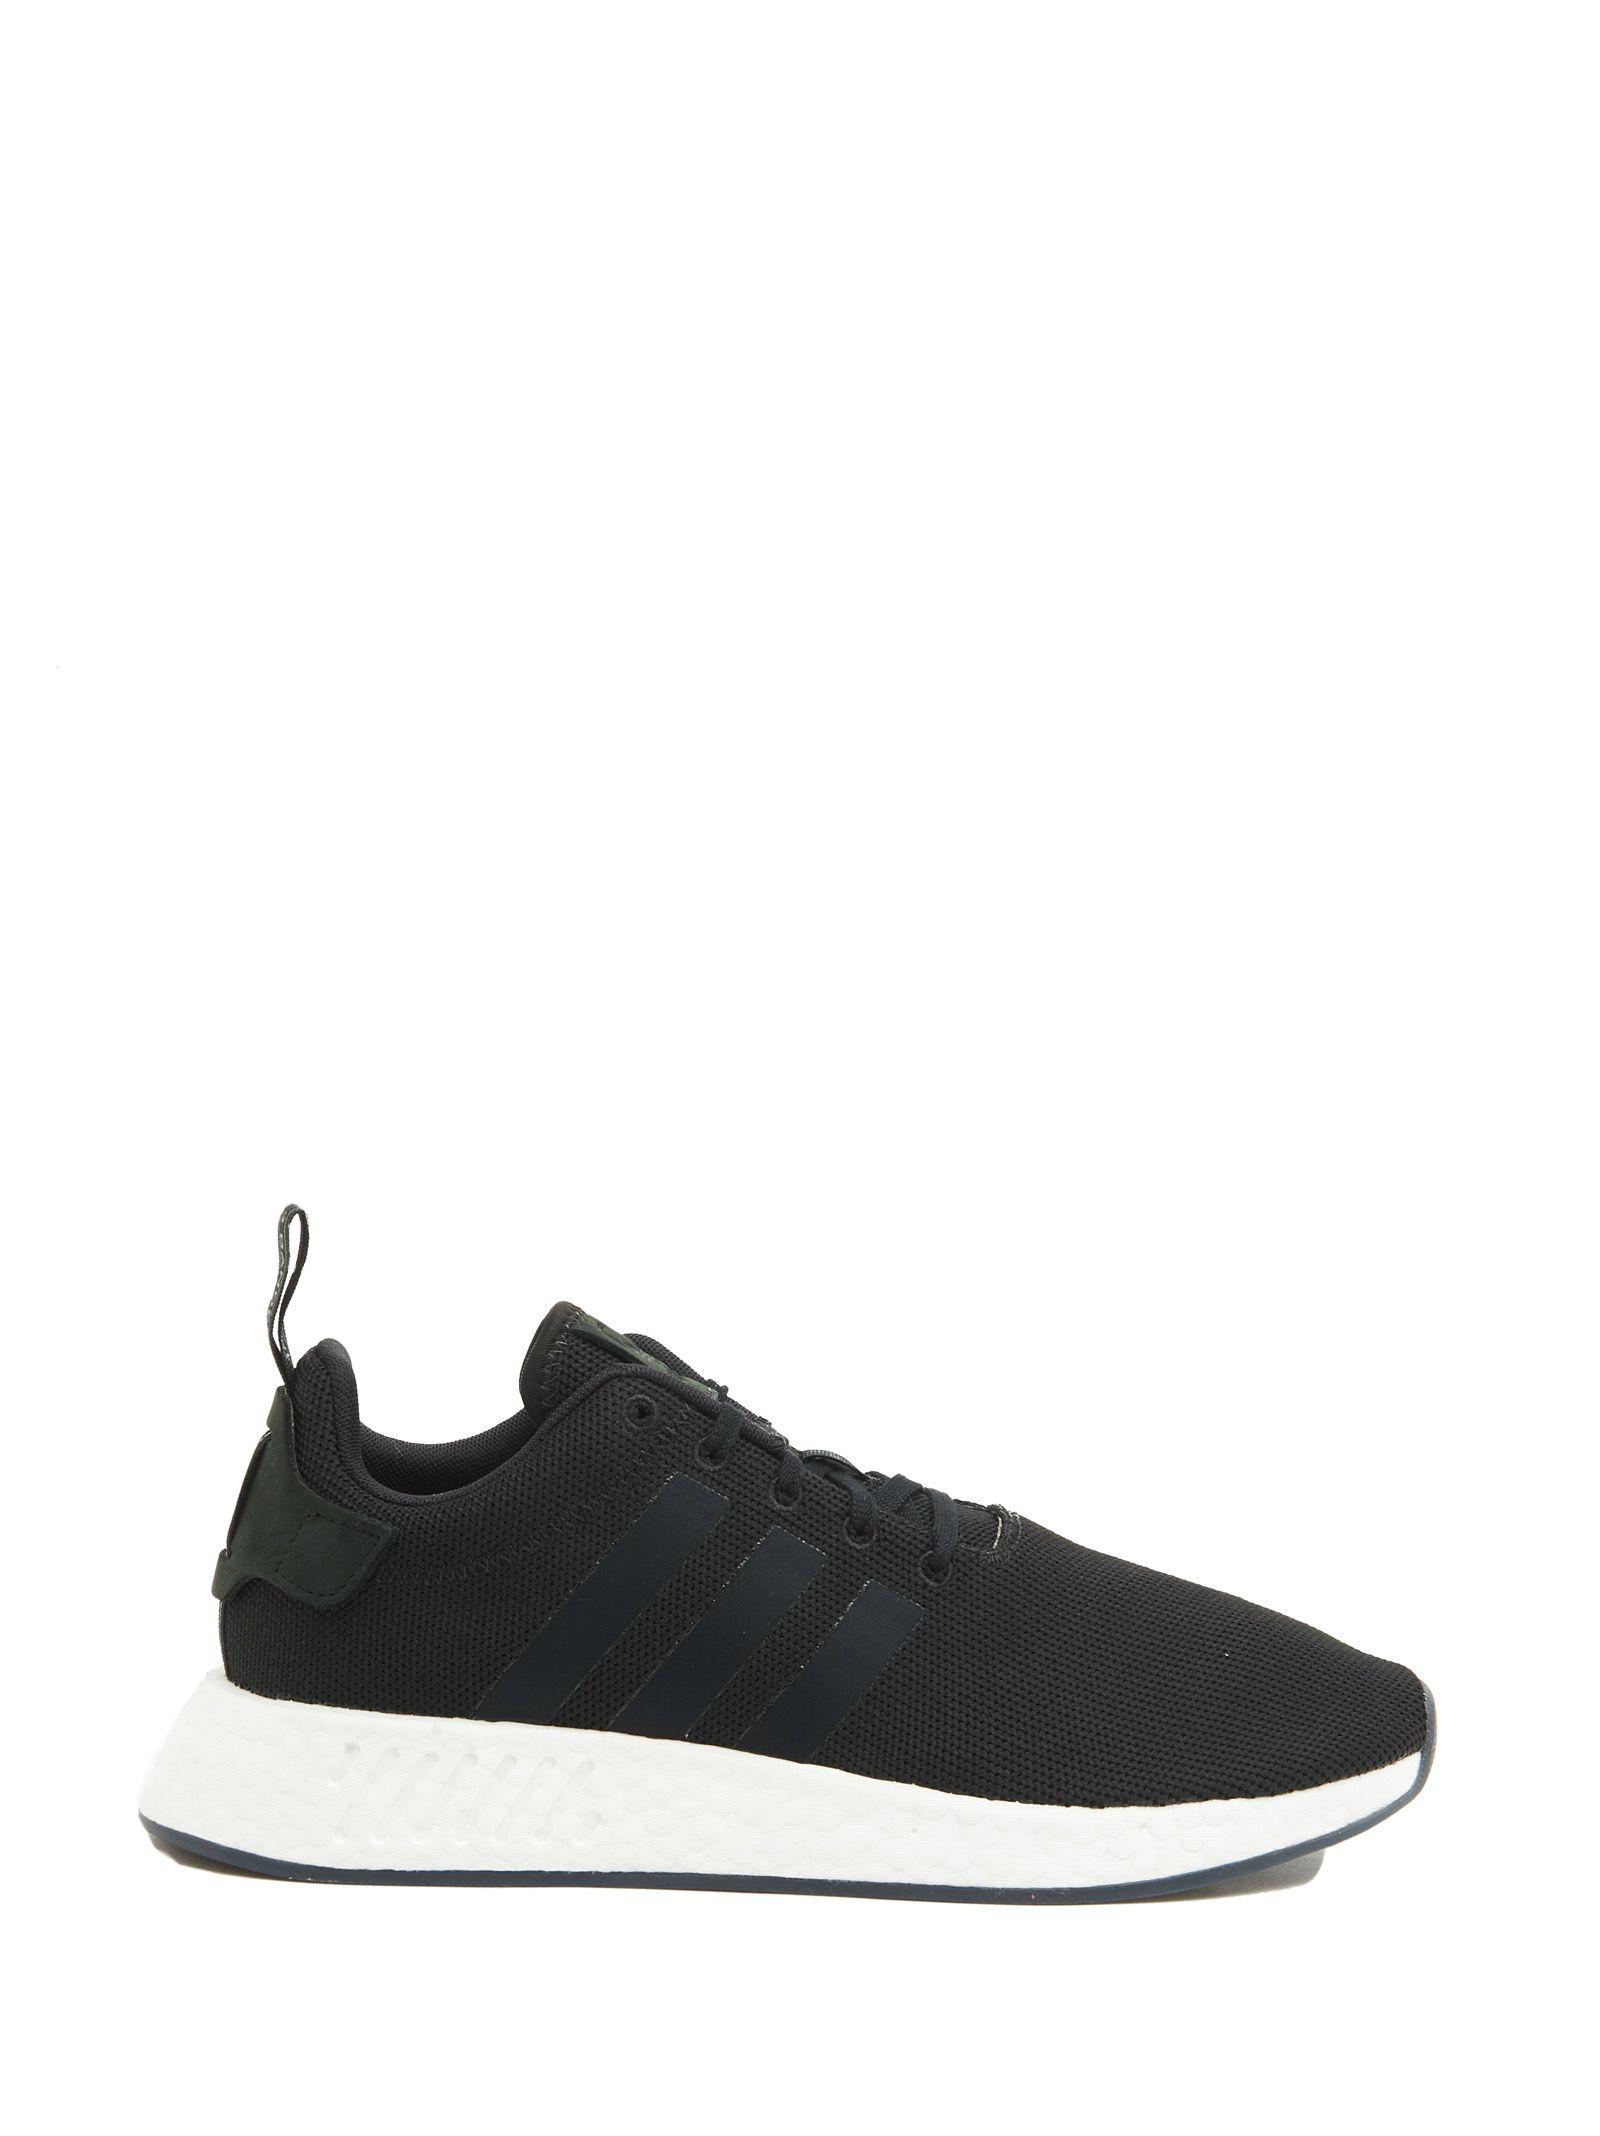 low priced eb9d7 b5994 Adidas Originals  nmd R2  Shoes ...